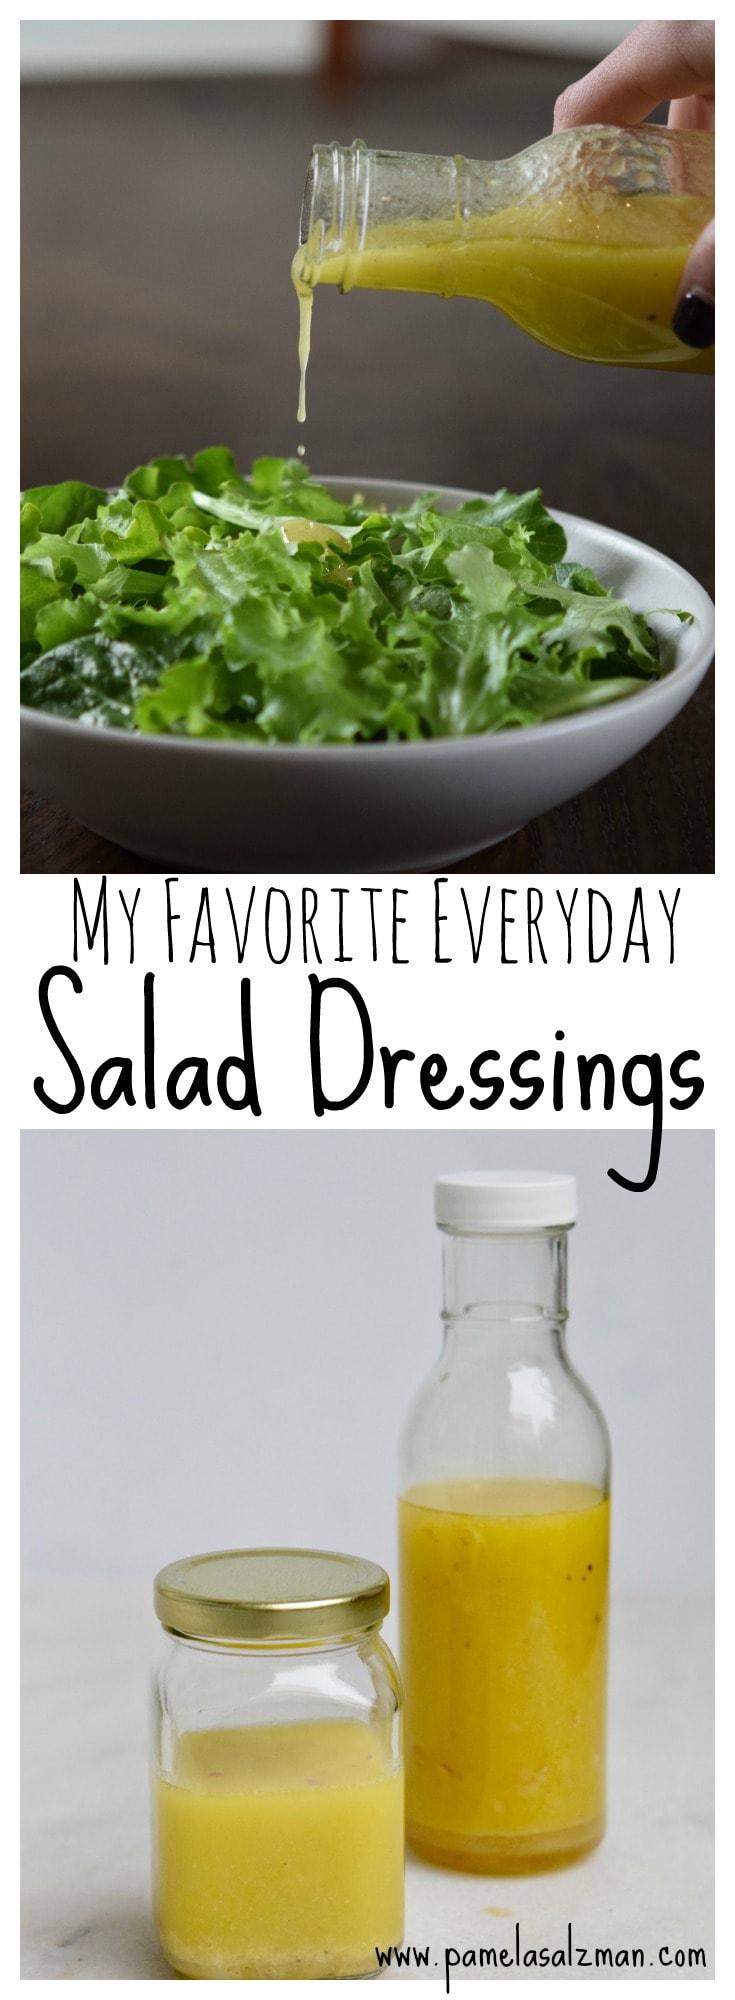 my favorite everyday salad dressing recipes | Pamela Salzman & Recipes